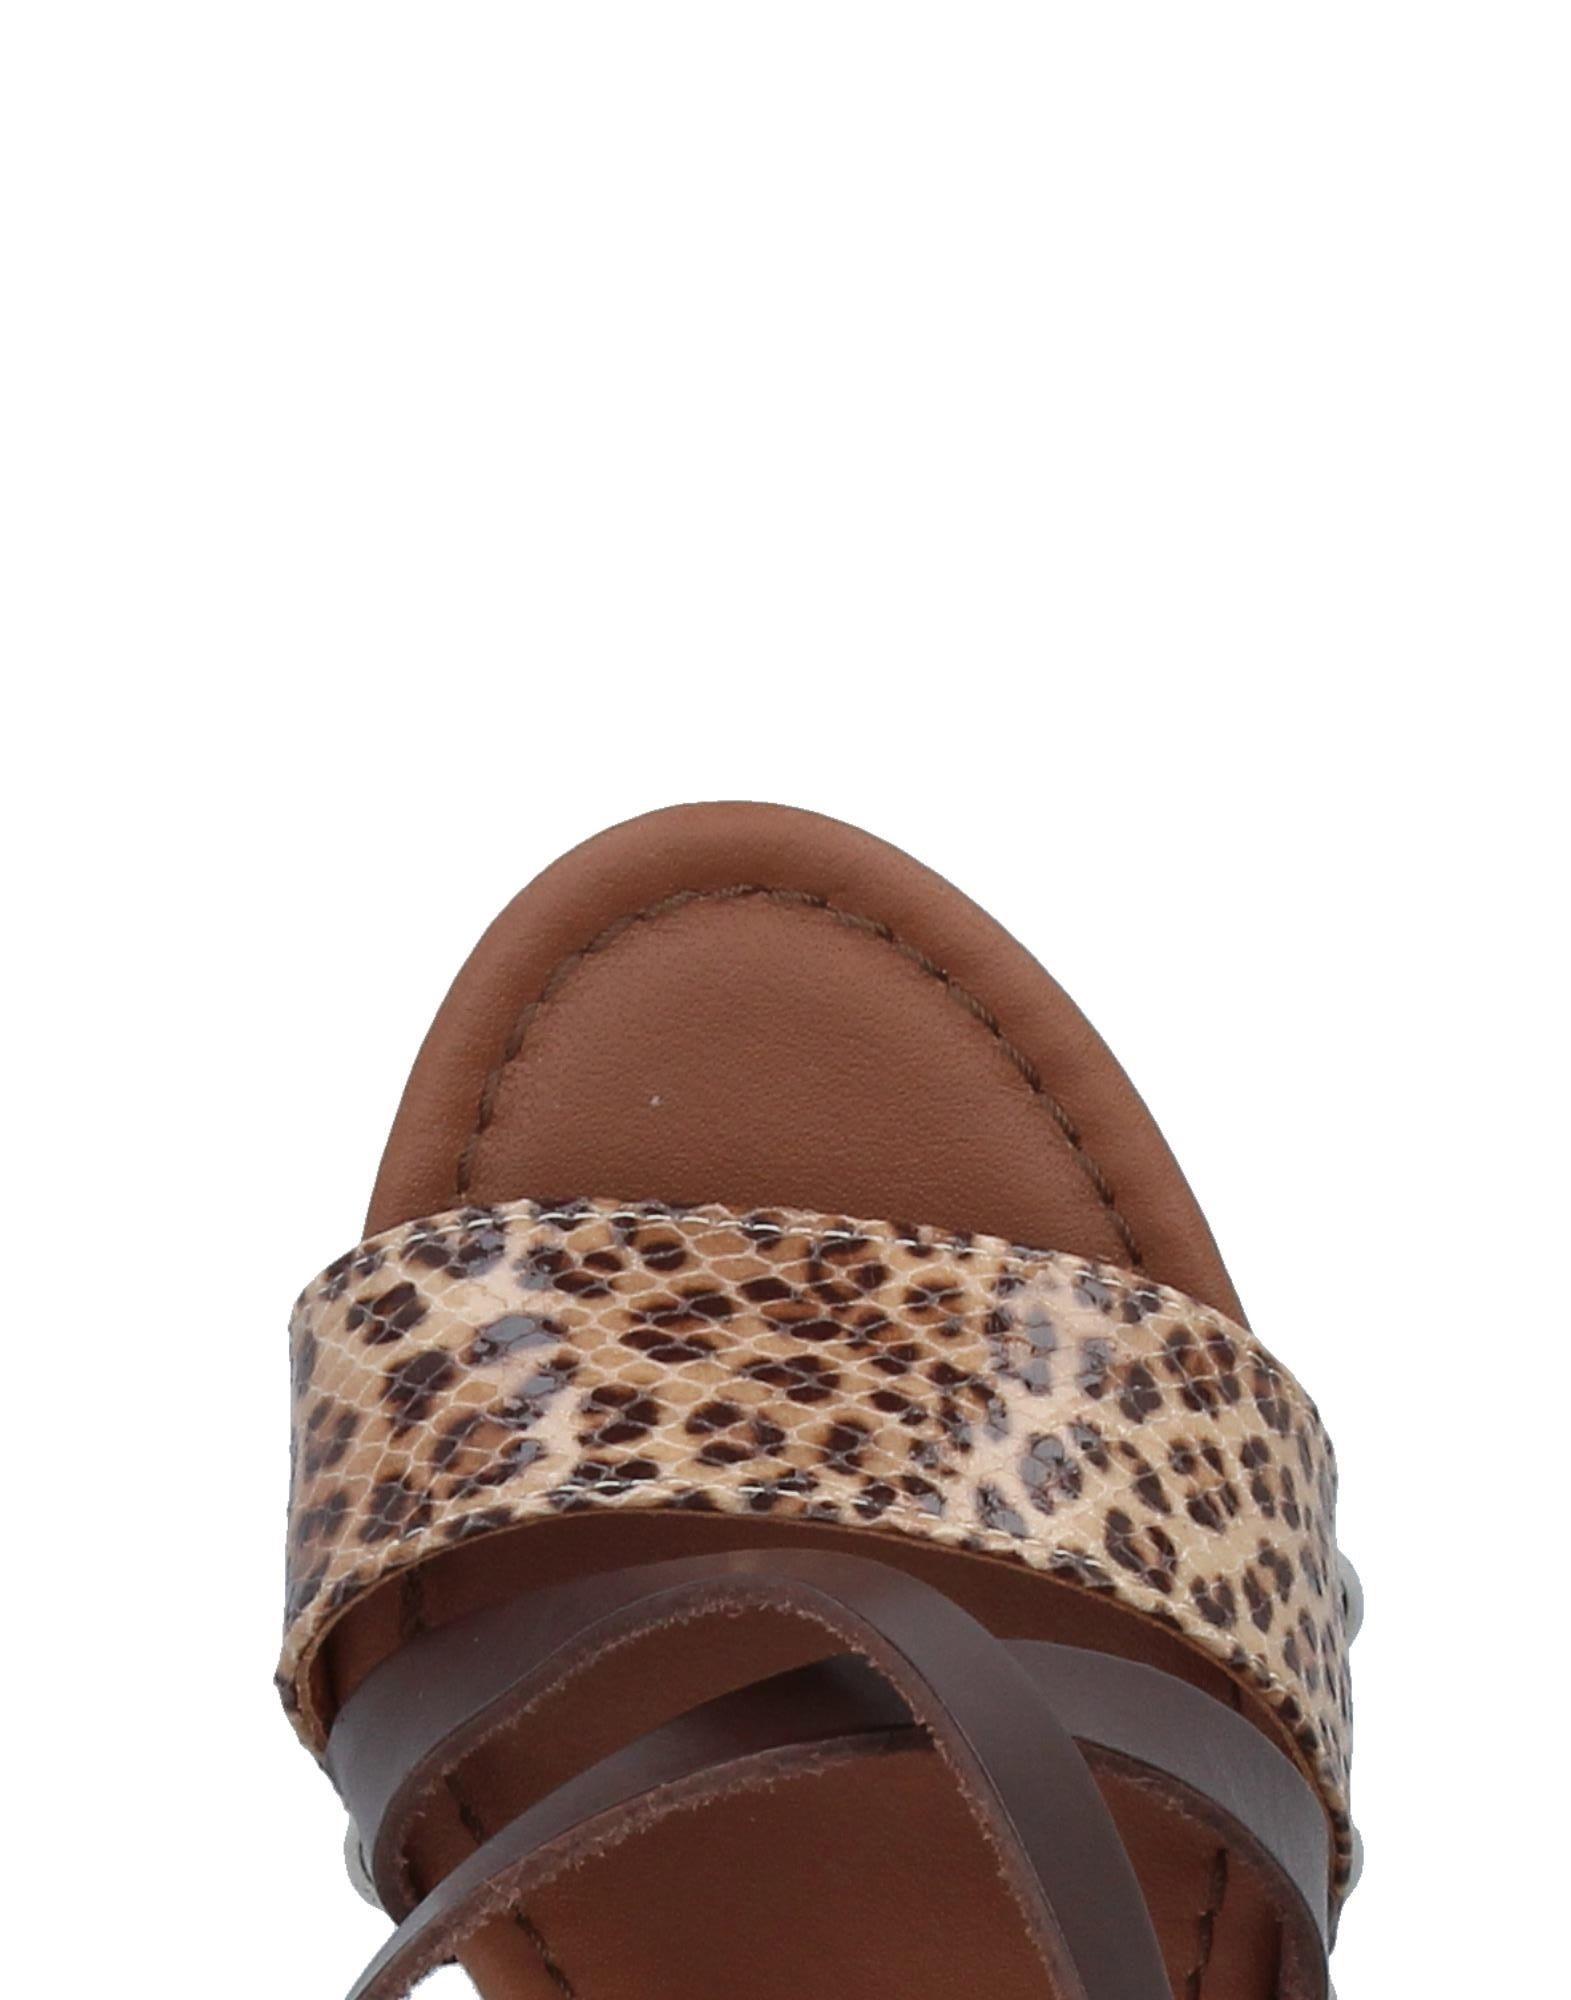 Tosca Shoes Blu Shoes Tosca Sandalen Damen  11371307UA Gute Qualität beliebte Schuhe 6be656